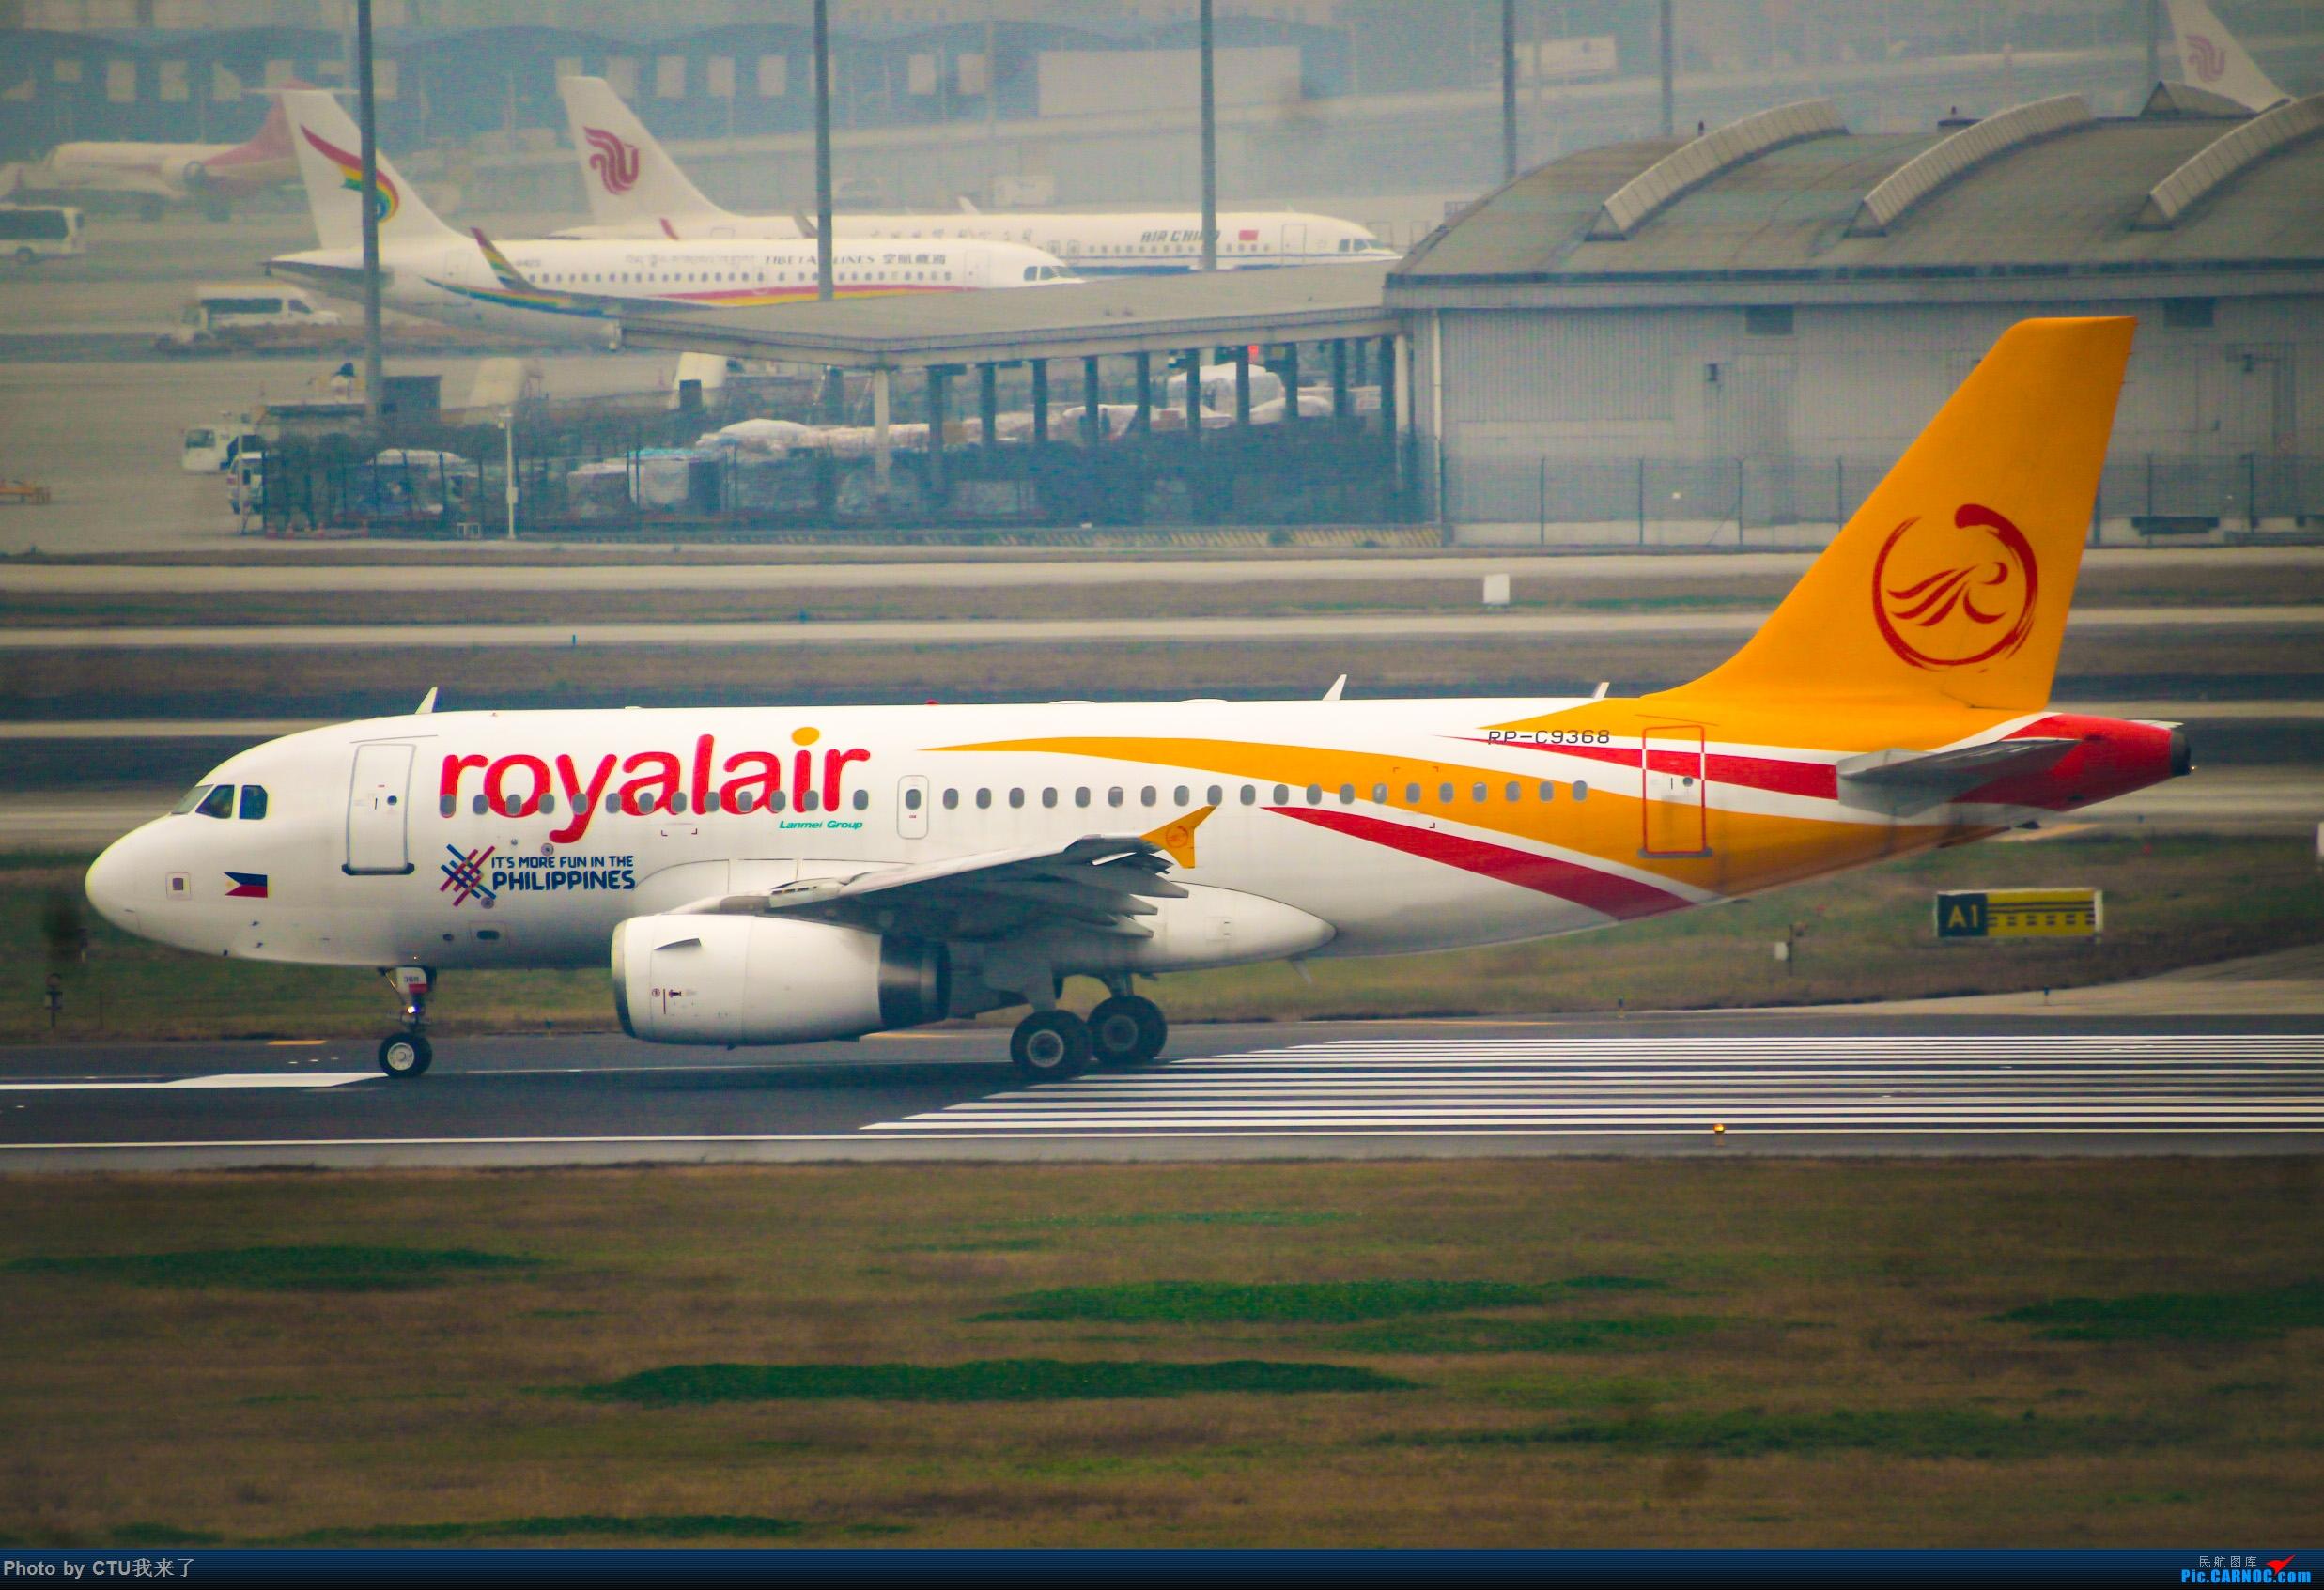 Re:[原创]CTU水泥天拍机,验证烂天好货的铁律 AIRBUS A319-100 RP-C9368 中国成都双流国际机场